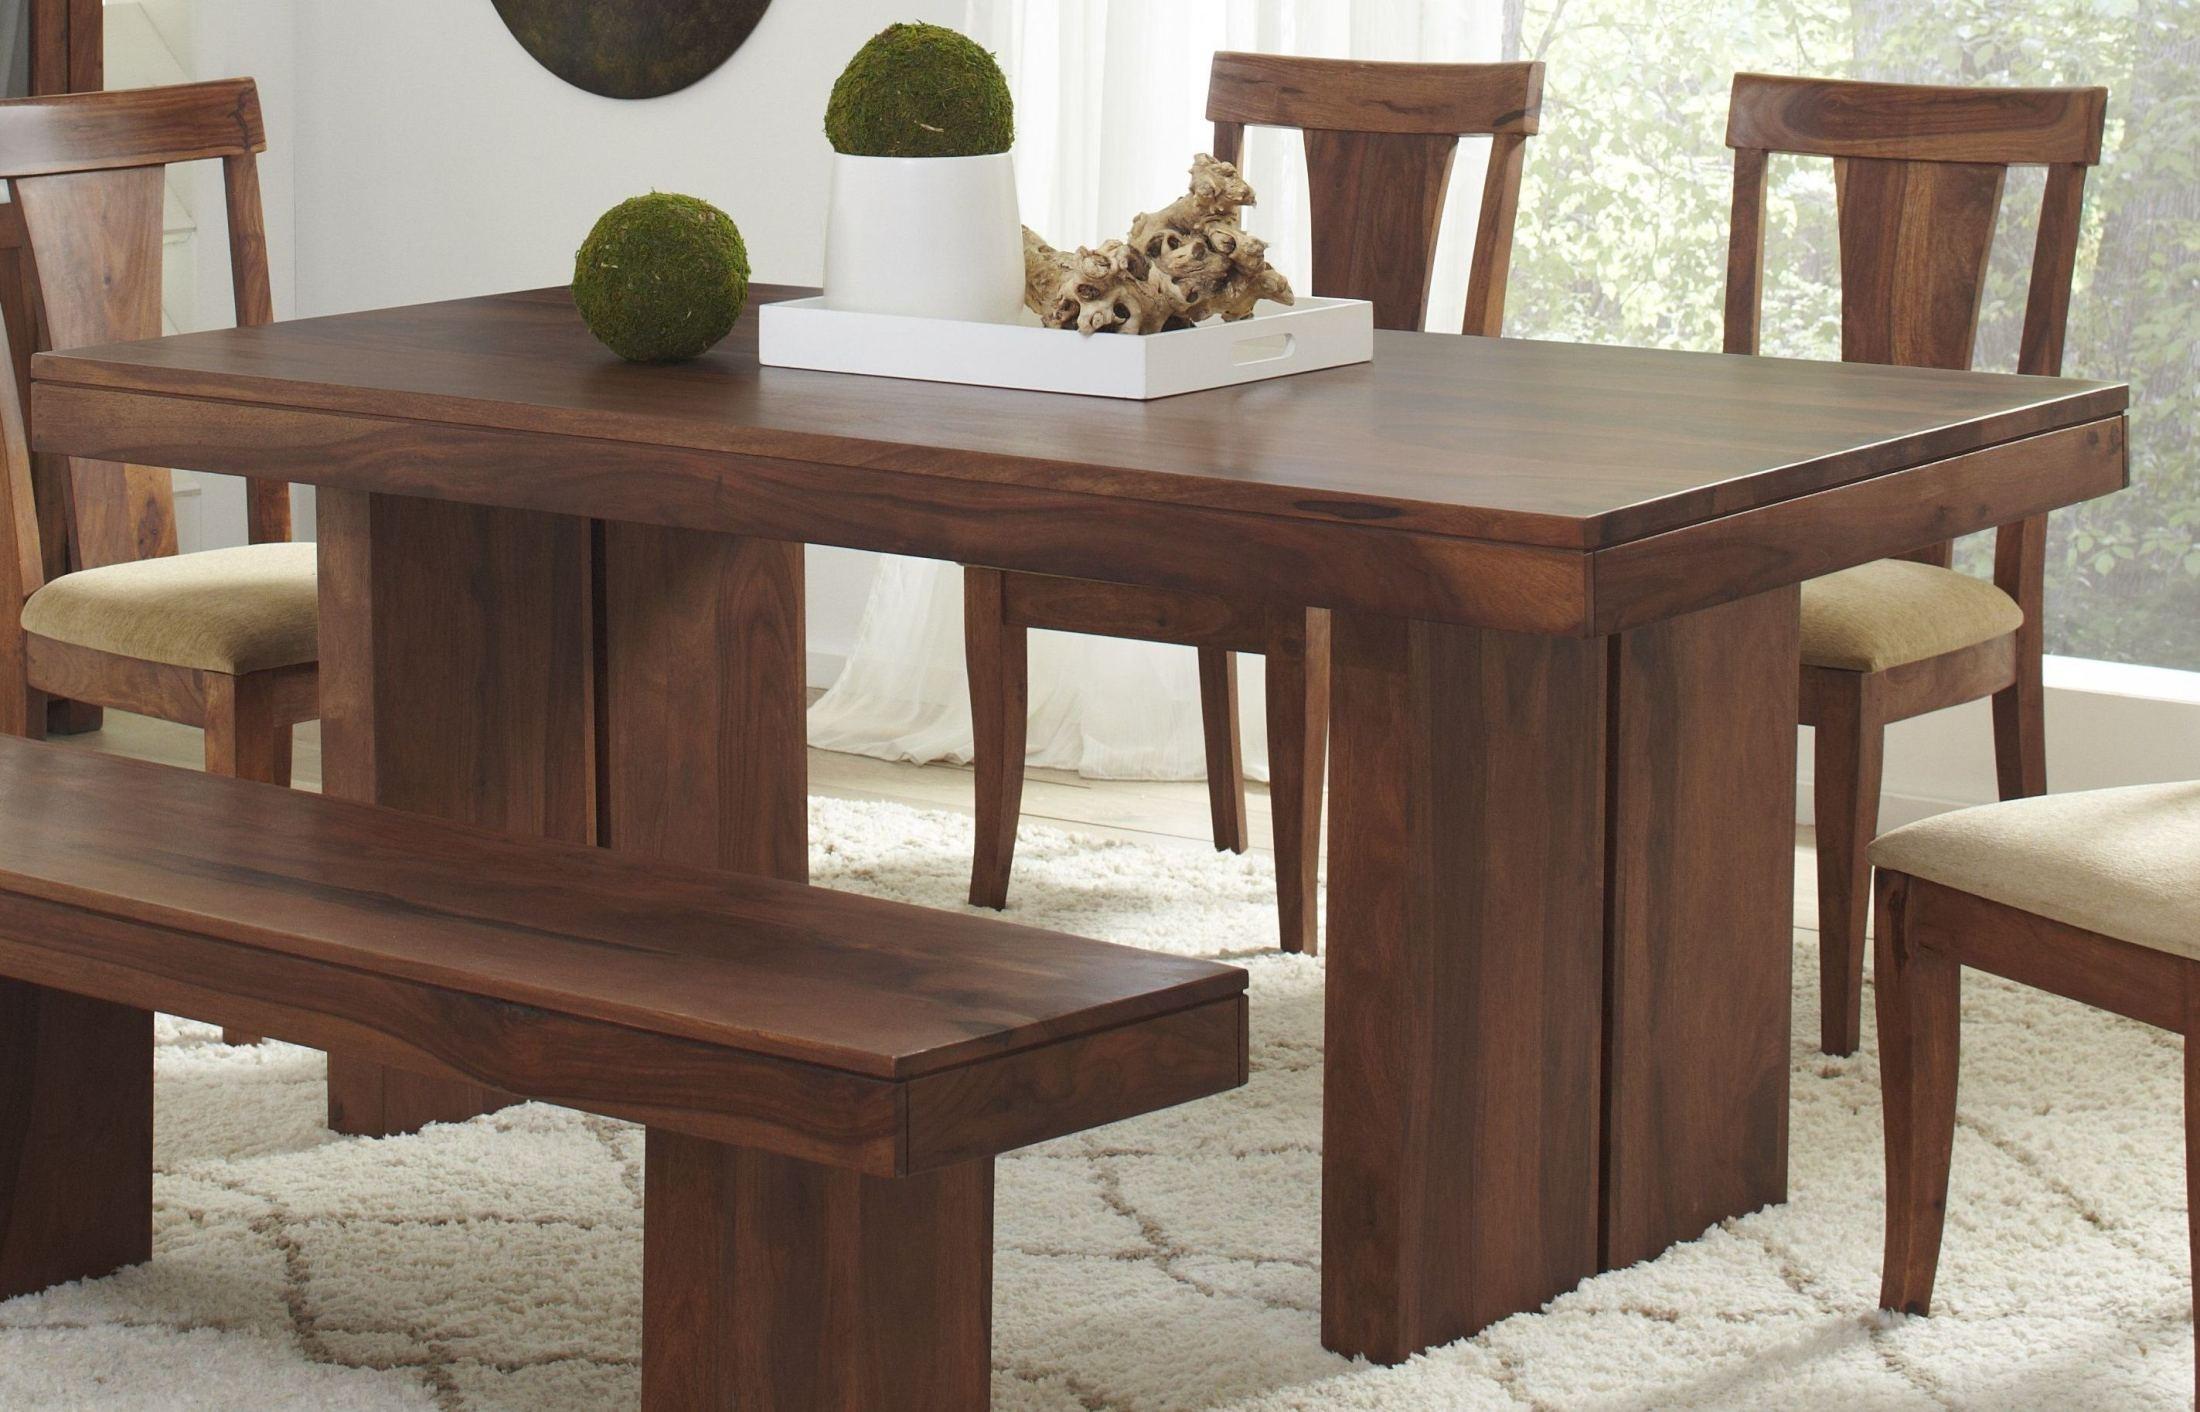 Harrison square rectangular dining table d301 31 largo - Square to rectangle dining table ...